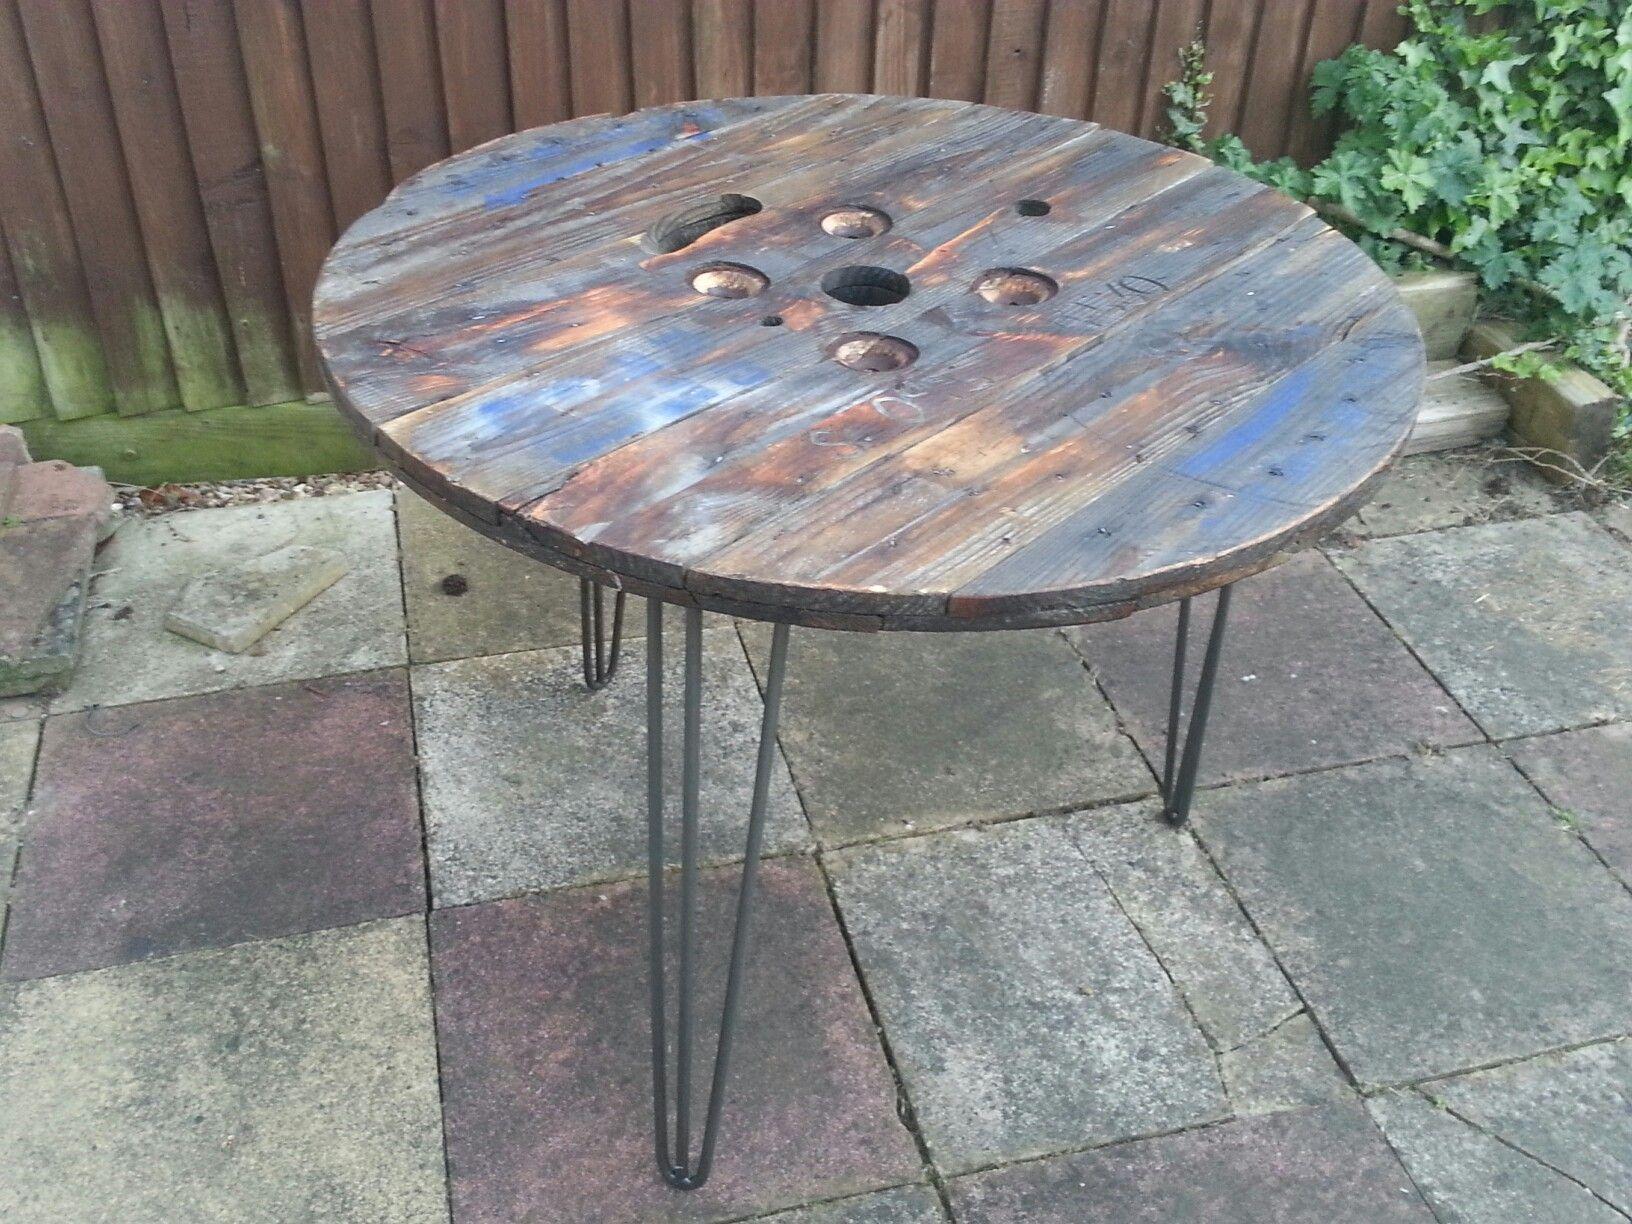 Cable drum outdoor table outdoor table outdoor